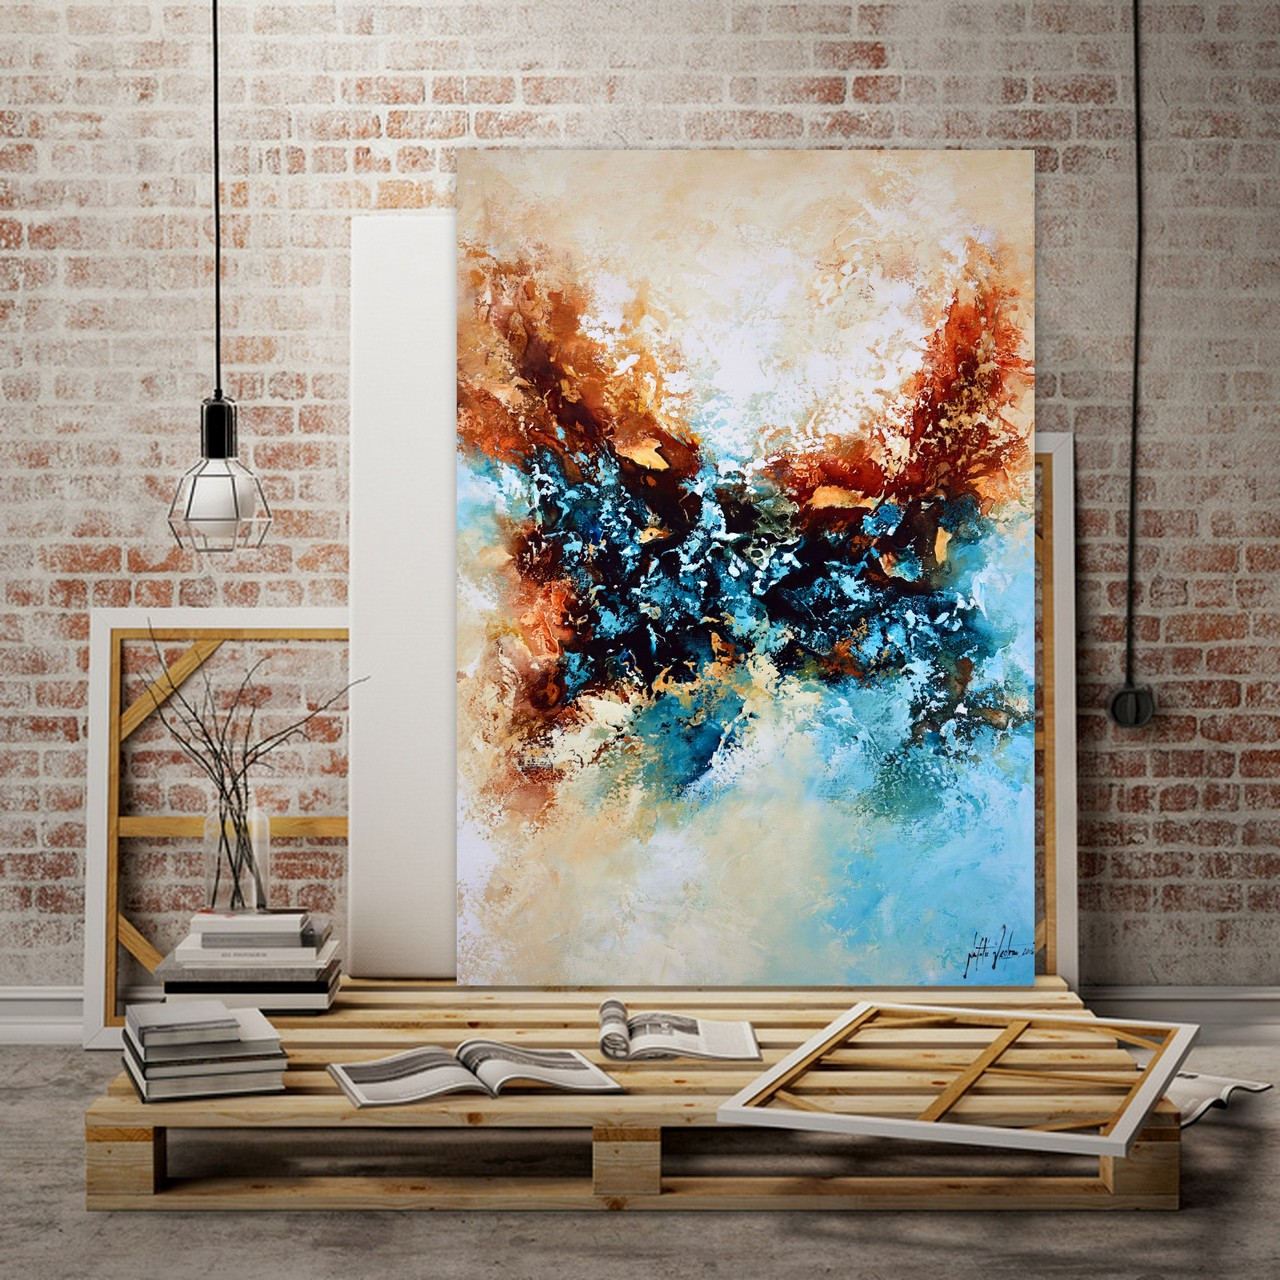 Online shop kunstgalerie natalie fedrau for Moderne acrylbilder wanddekorationen